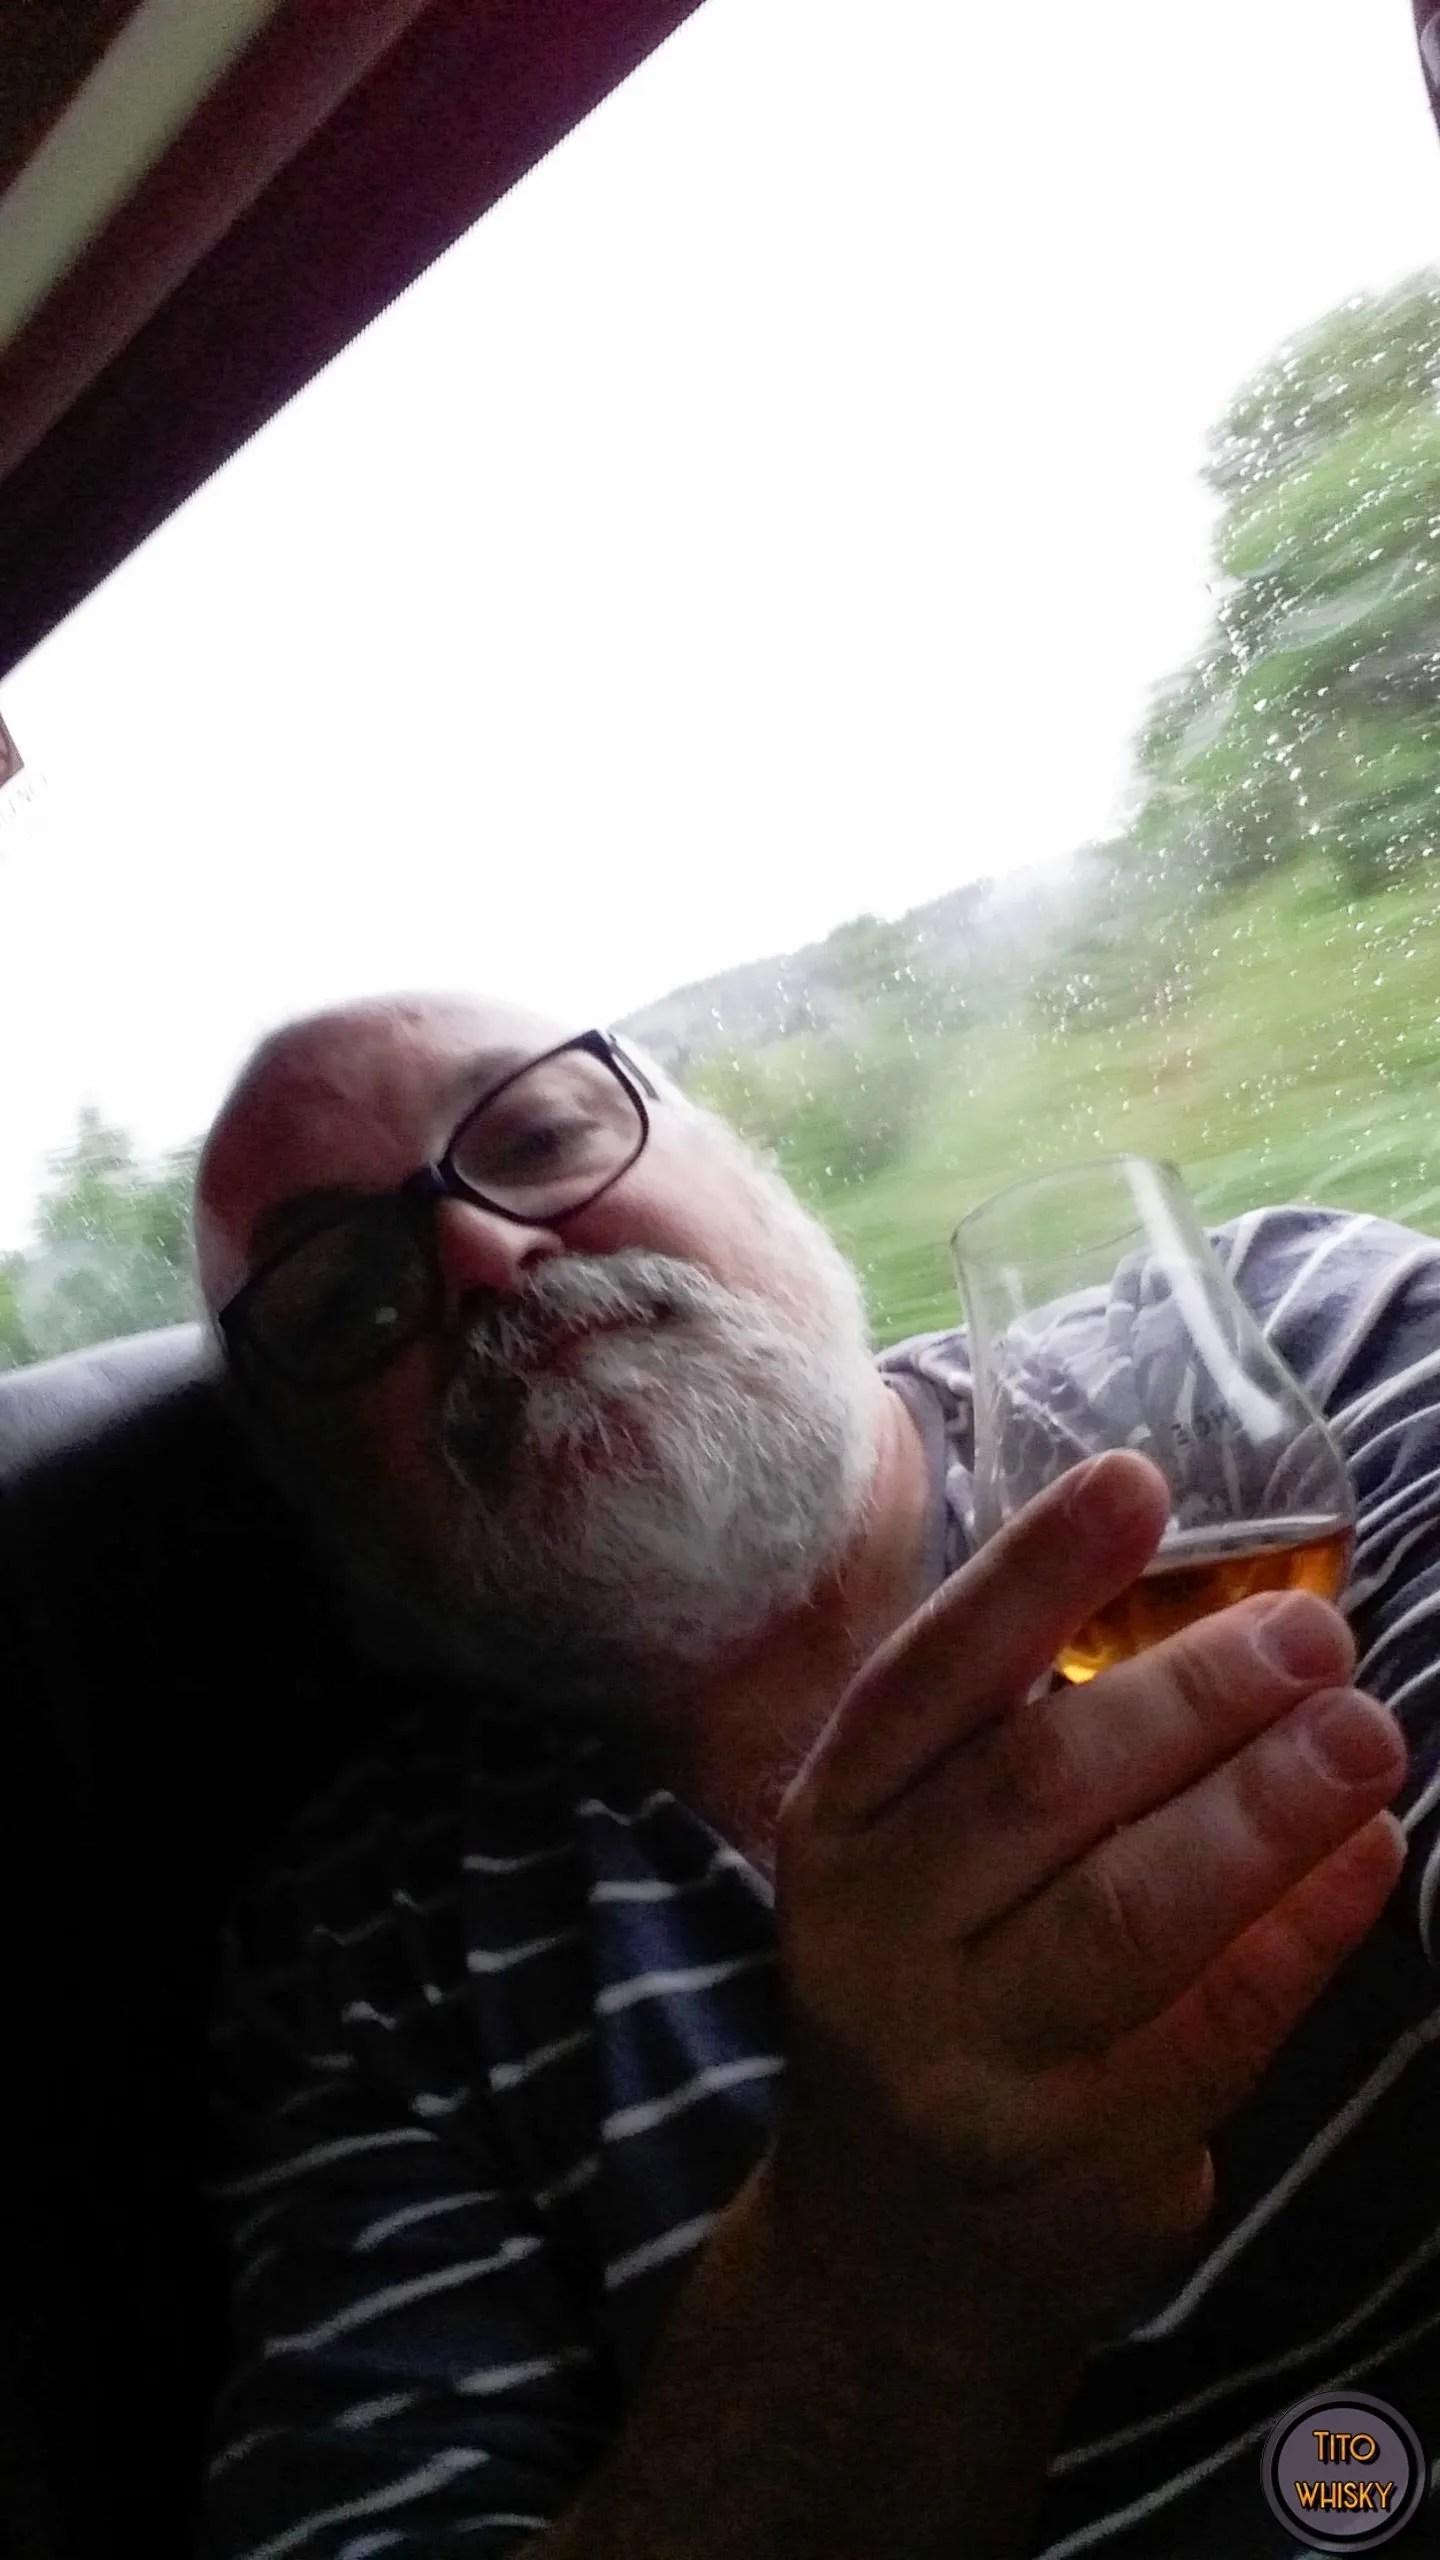 Tito tomando whisky Black bottle